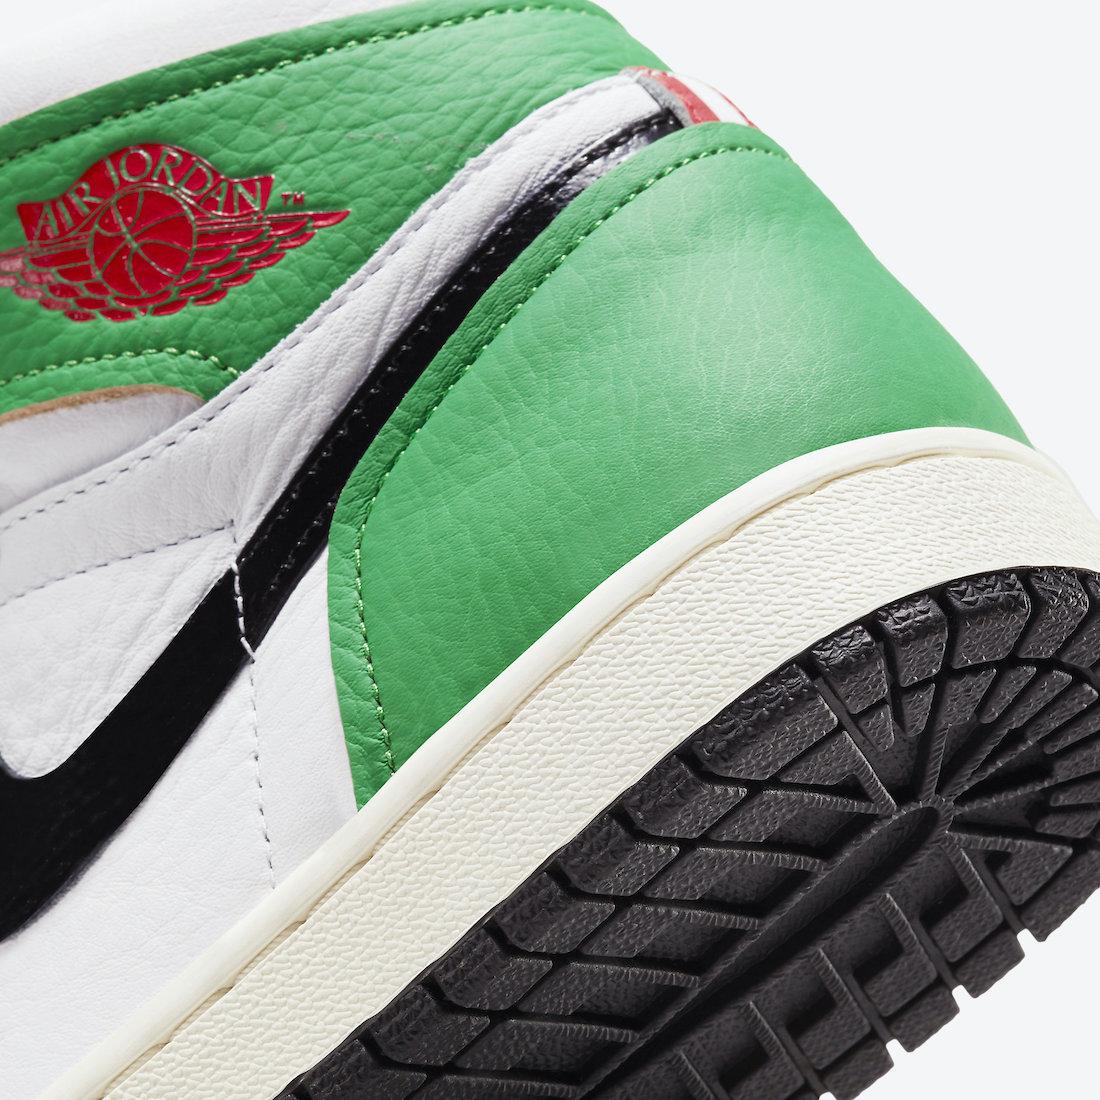 Air Jordan 1 'Lucky Green' DB4612-300 8